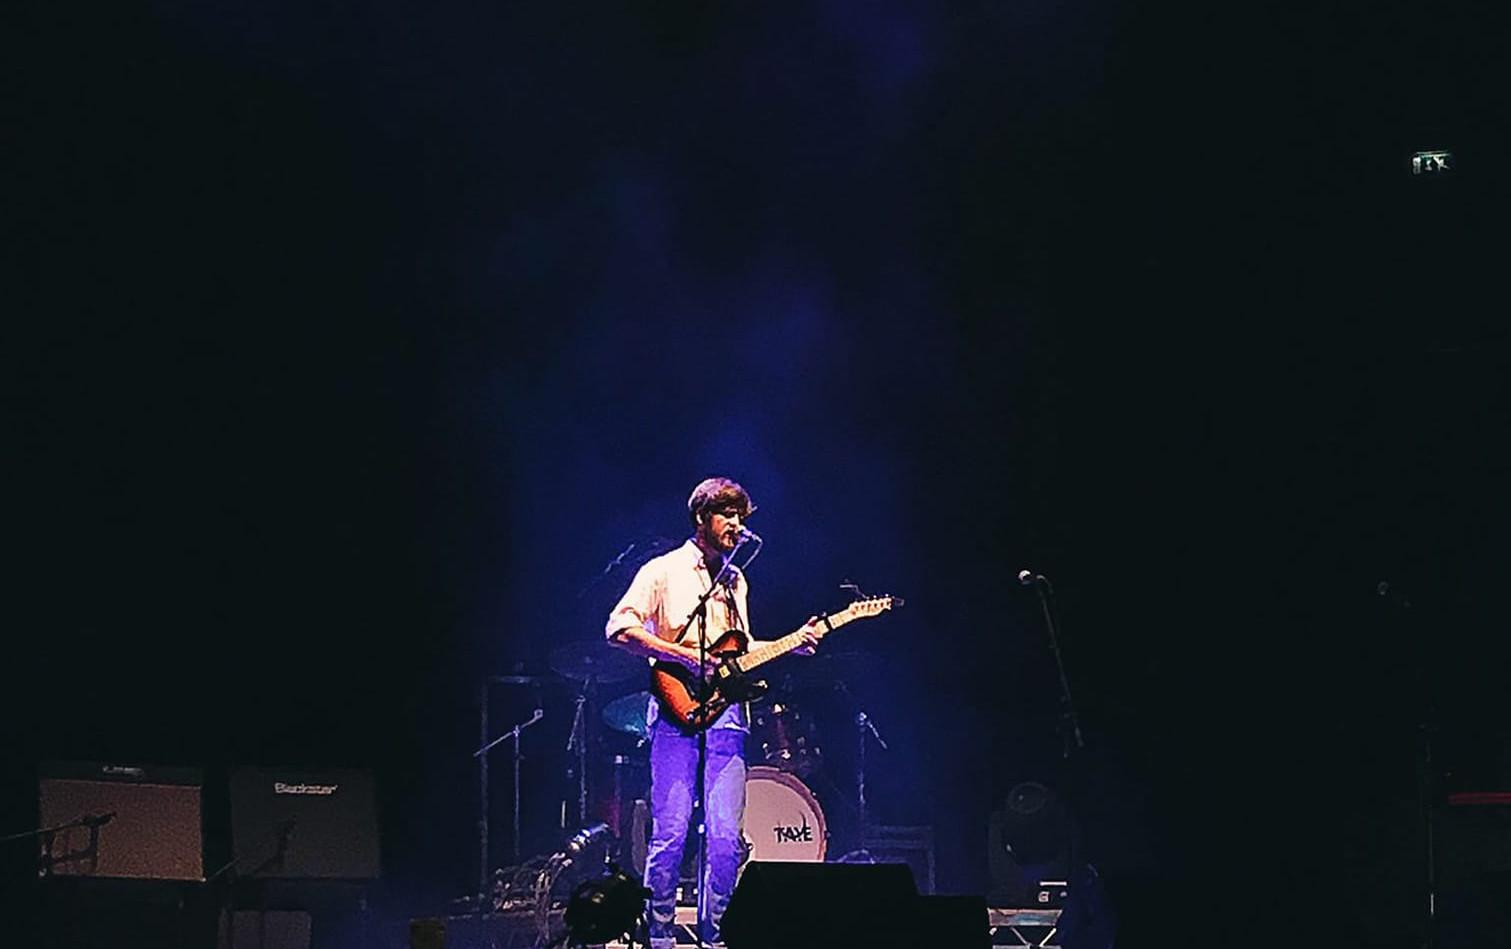 Playing solo @ Colston Hall, Bristol